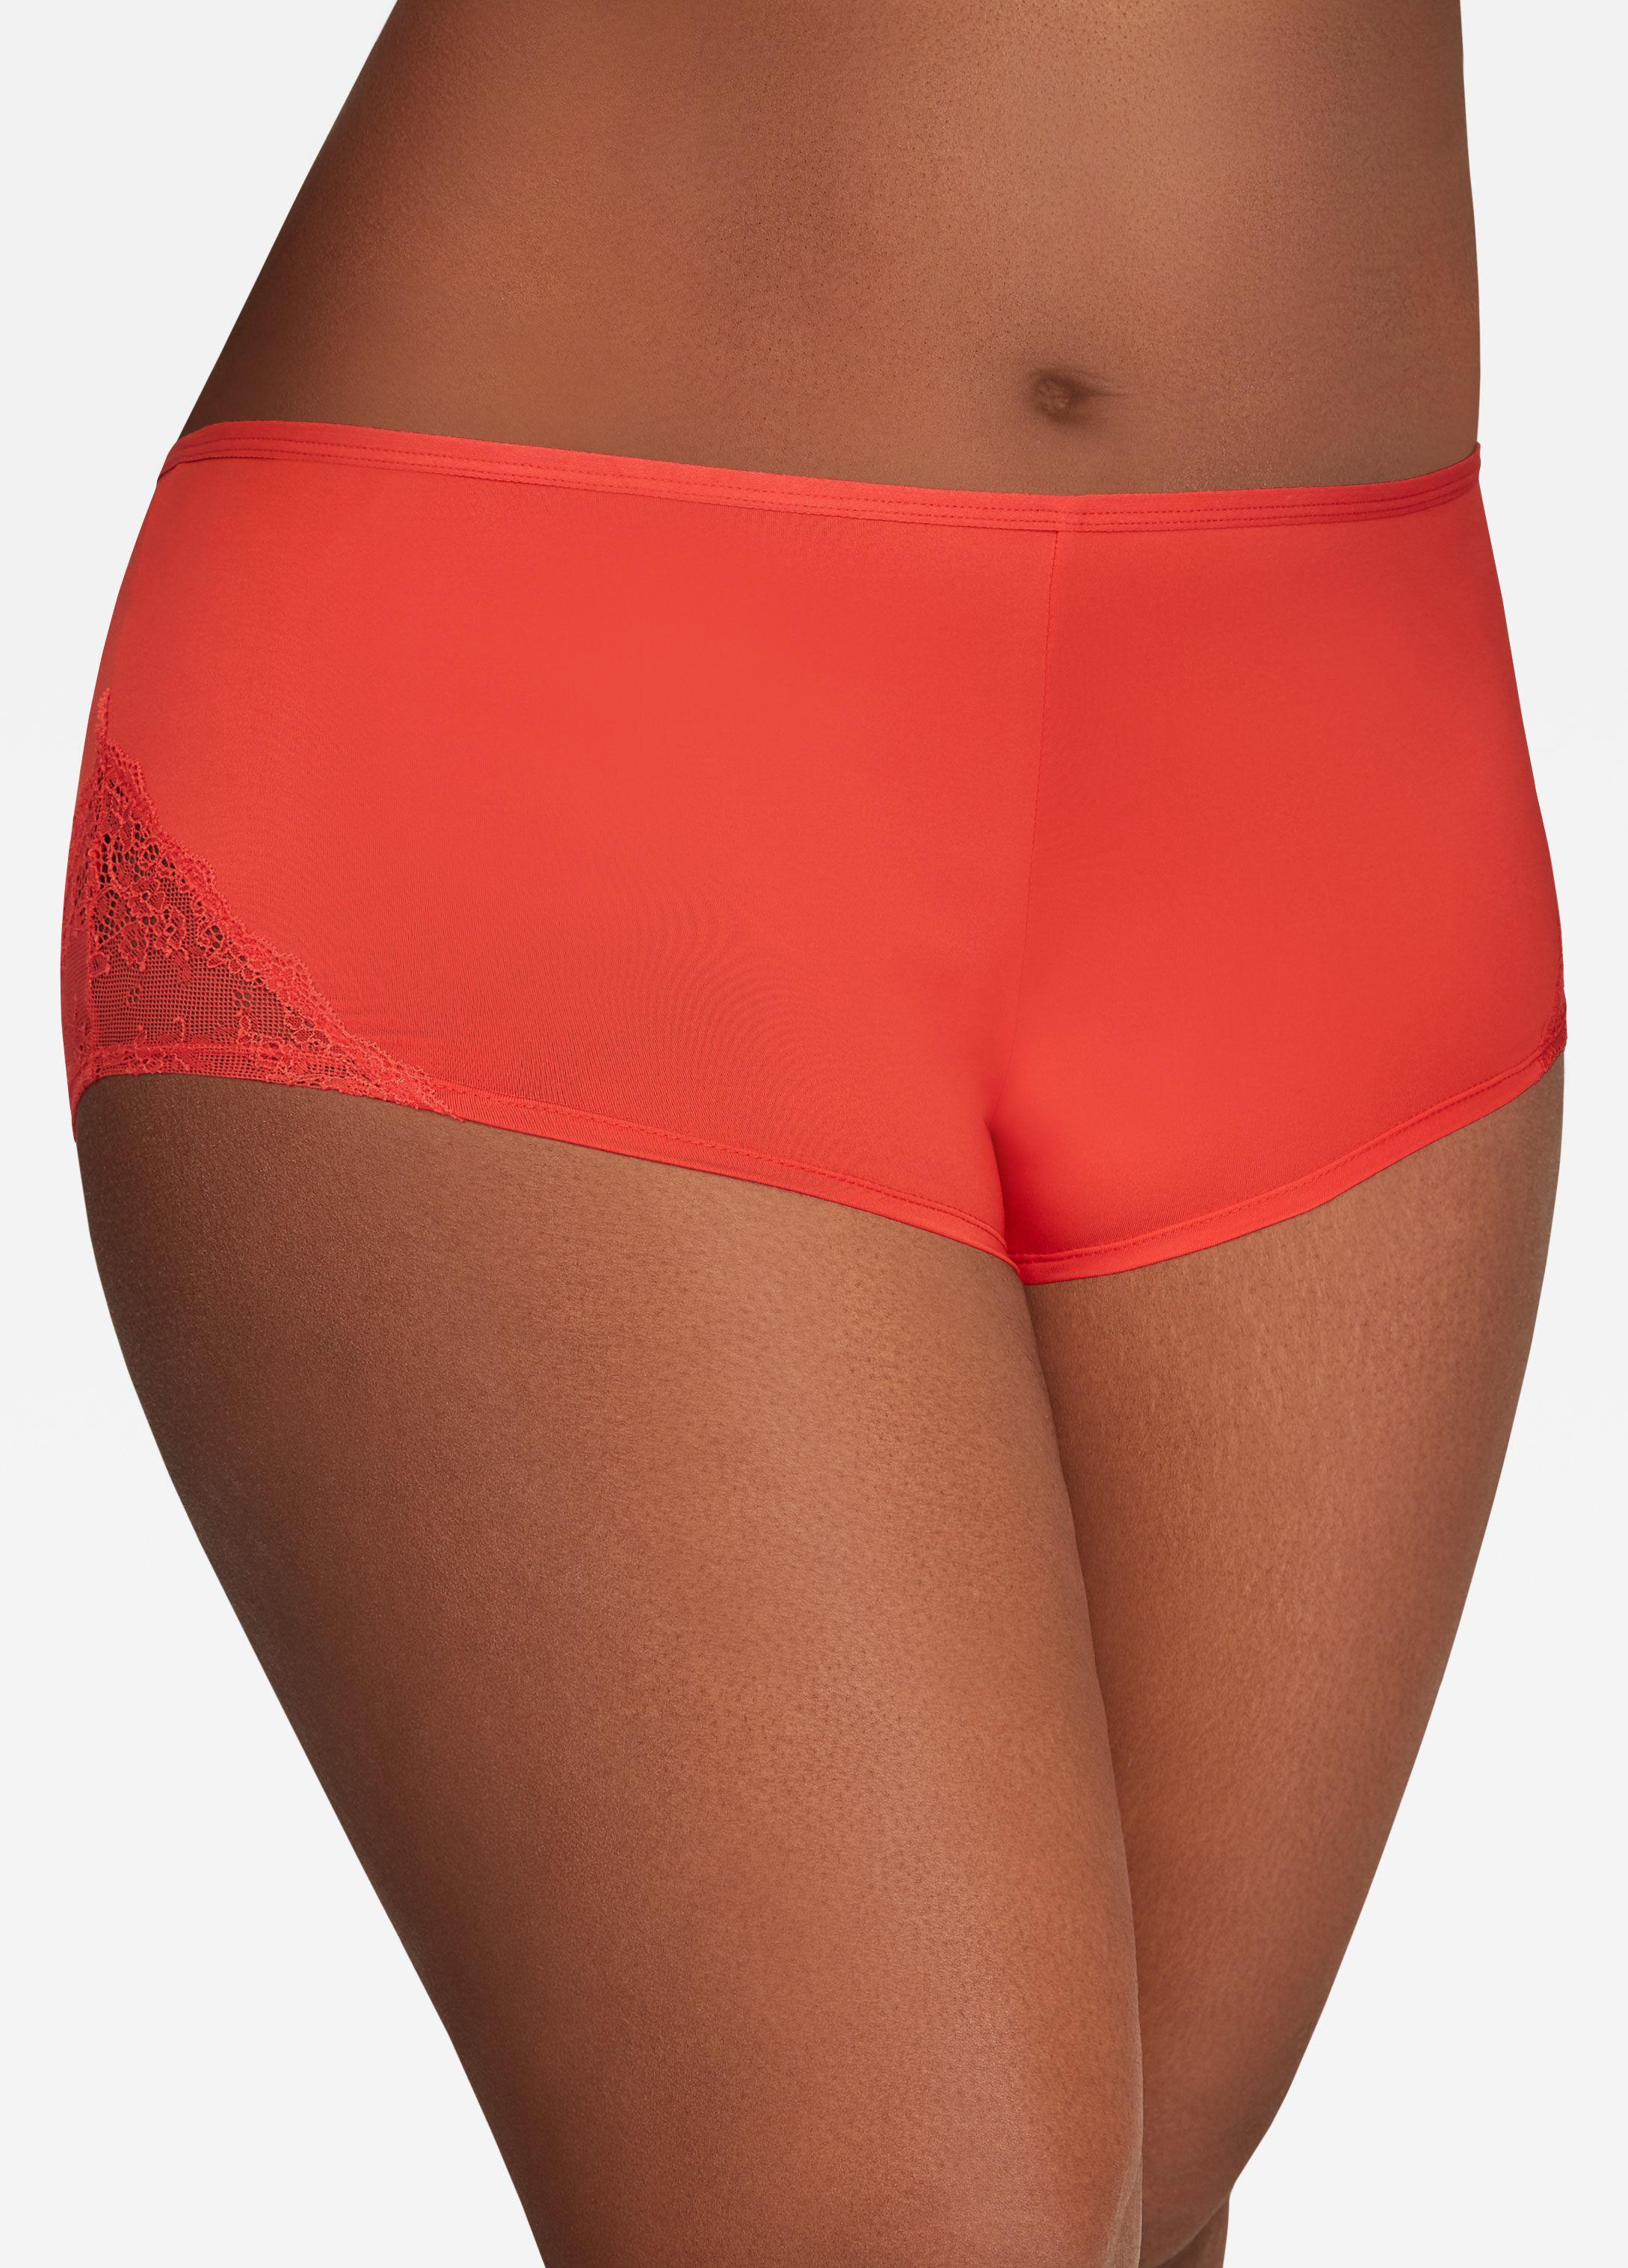 9ec9d051be9 Ashley Stewart Plus Size Lace Side Seamless Boyshort Panty in Red - Lyst